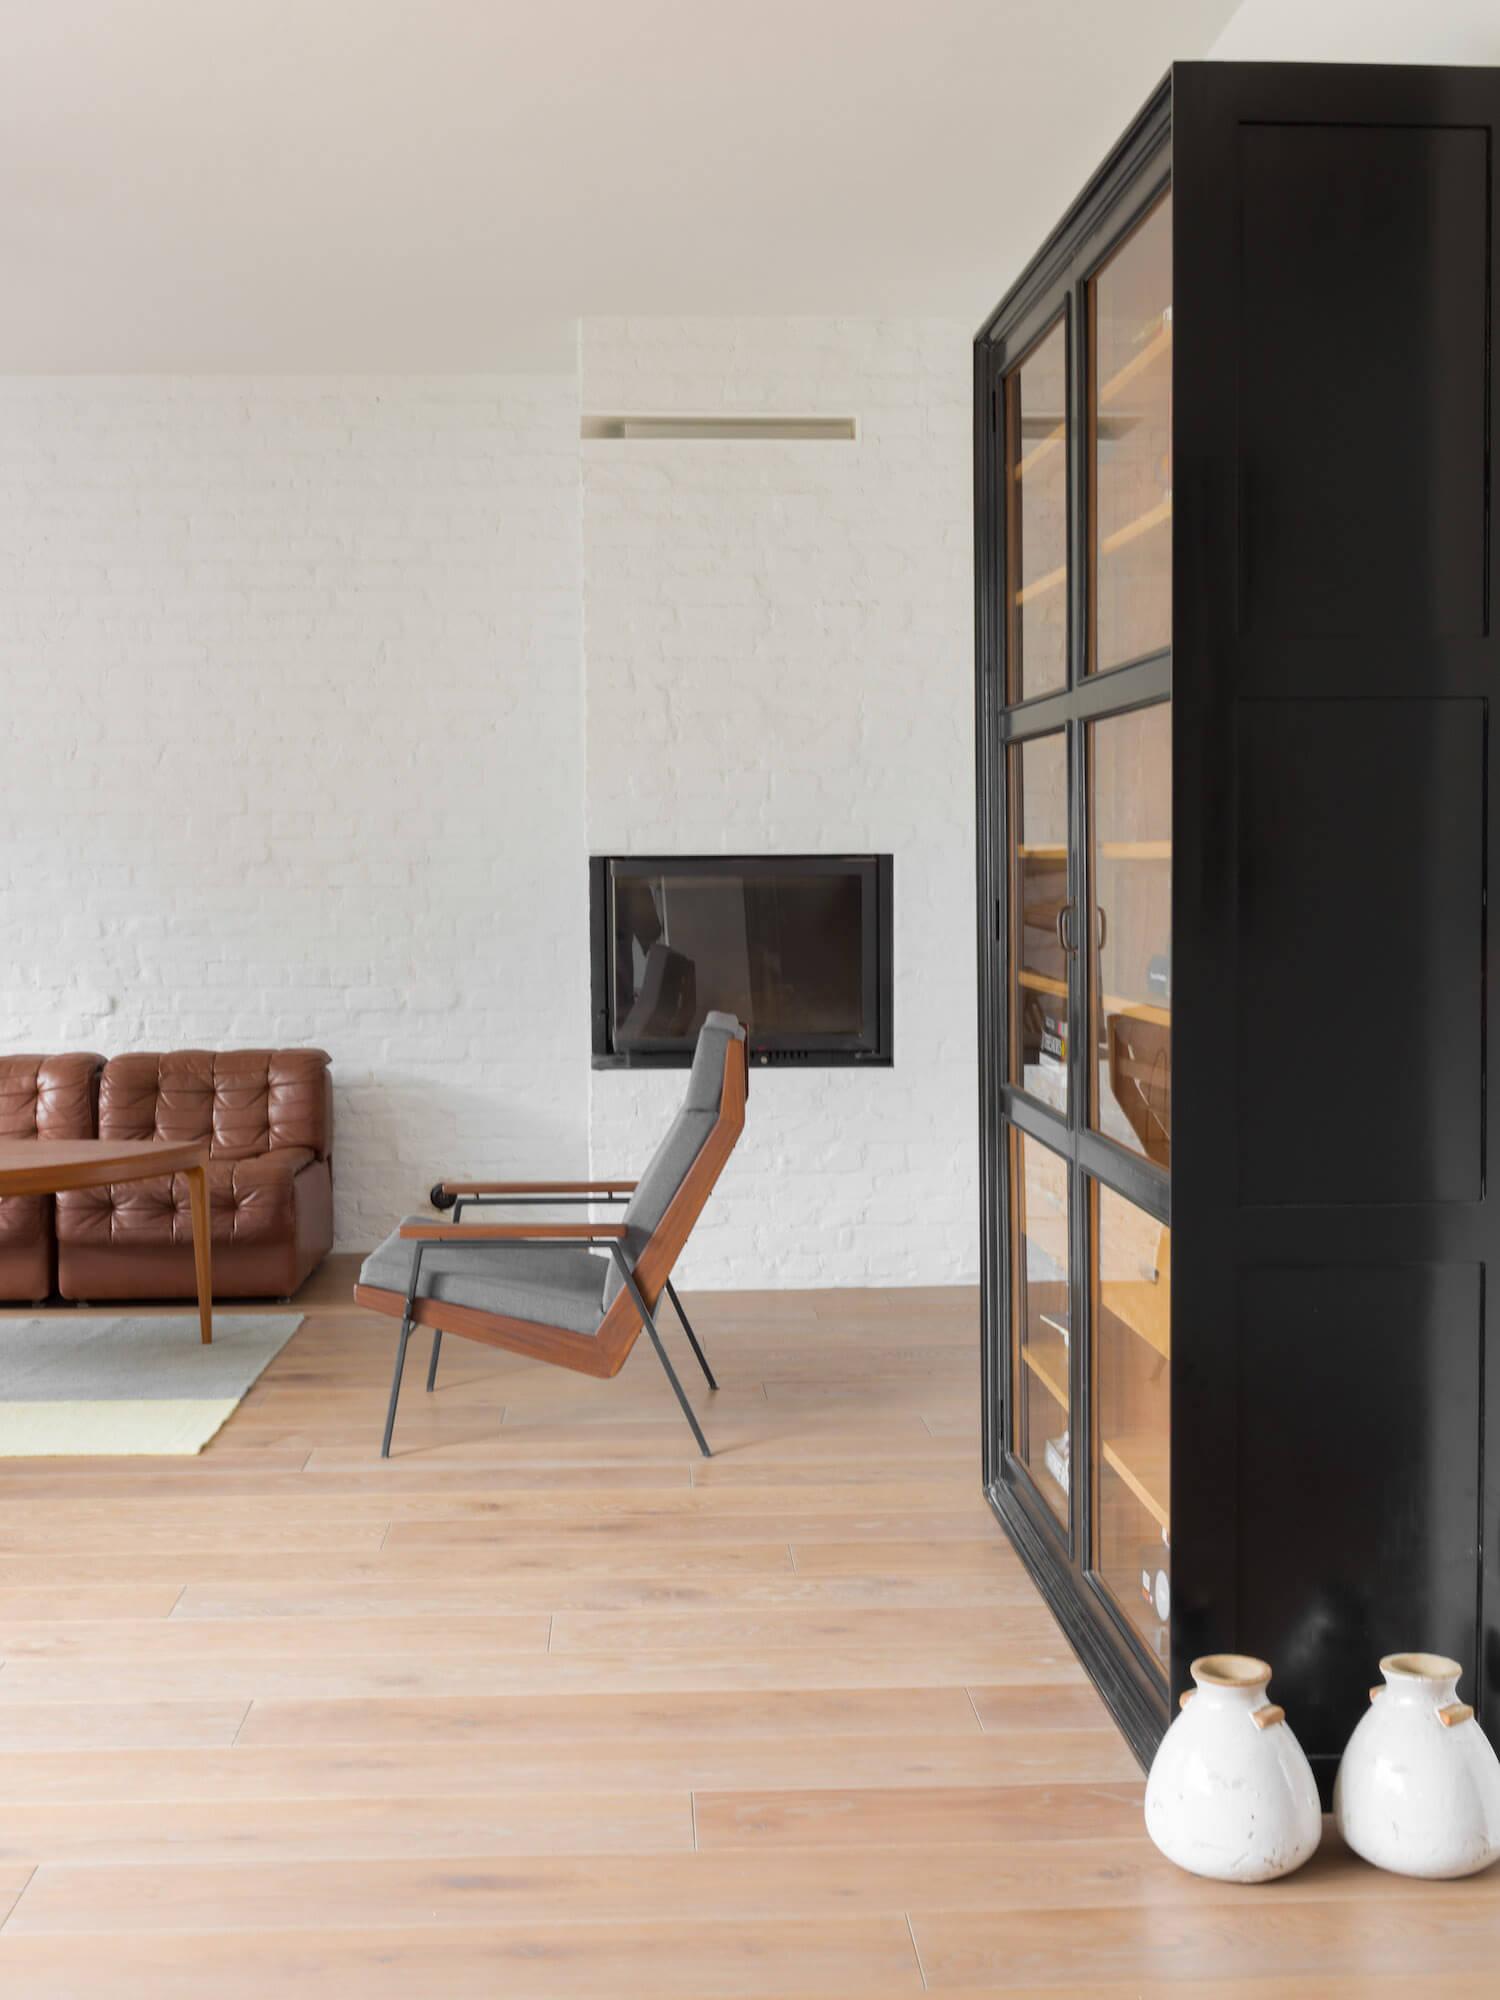 est living house by the park loft kolasinski 4